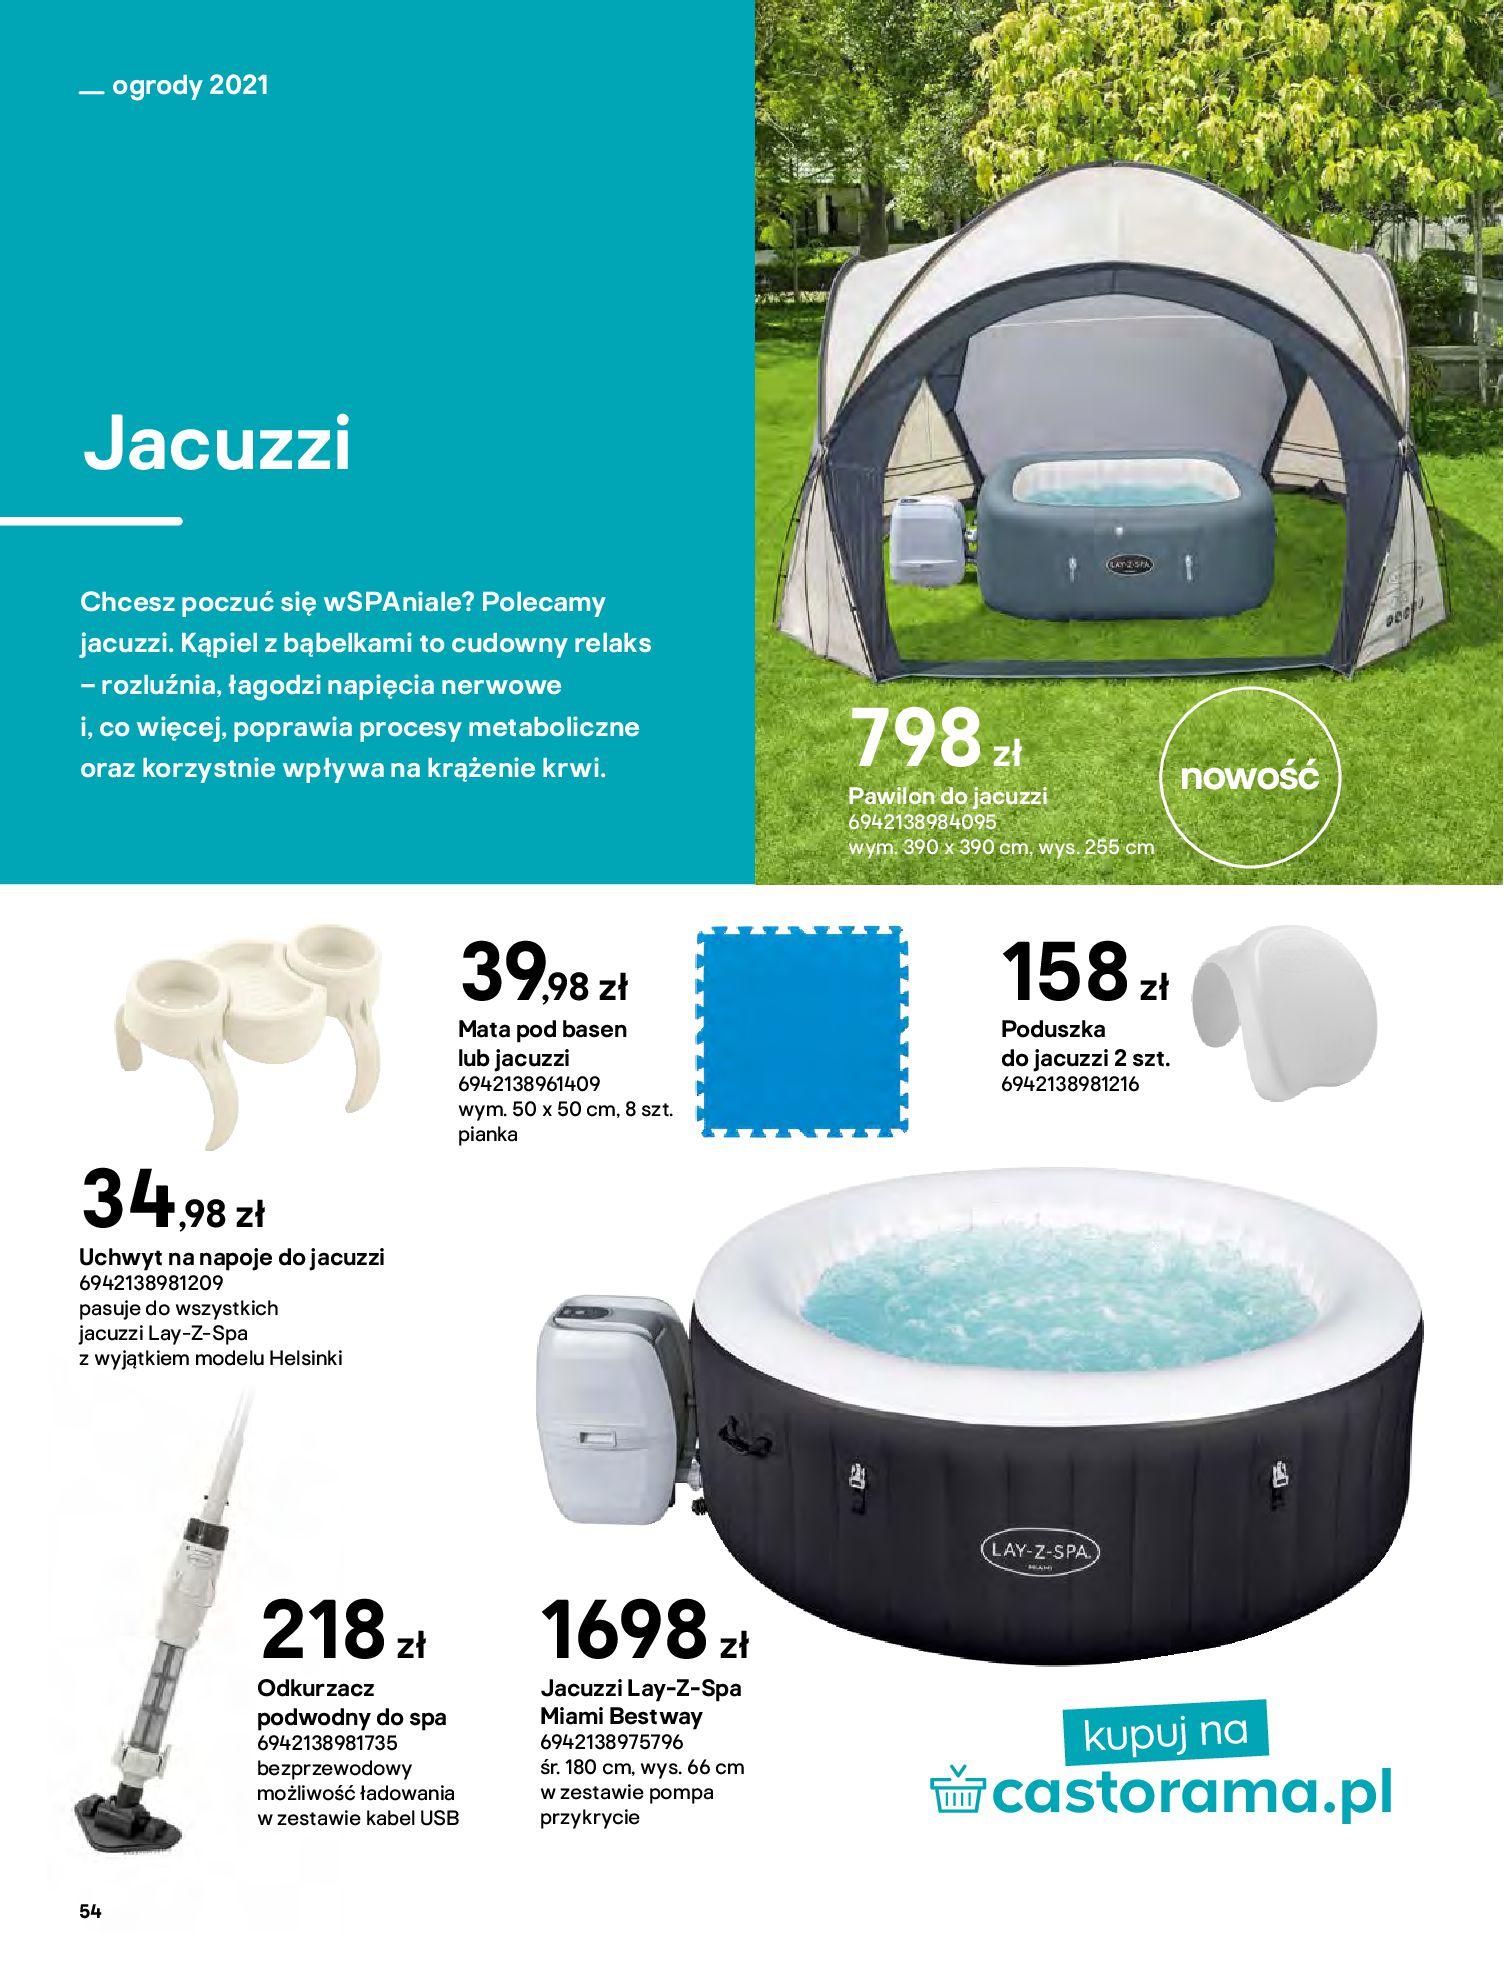 Gazetka Castorama: Katalog ogrody 2021-03-01 page-54